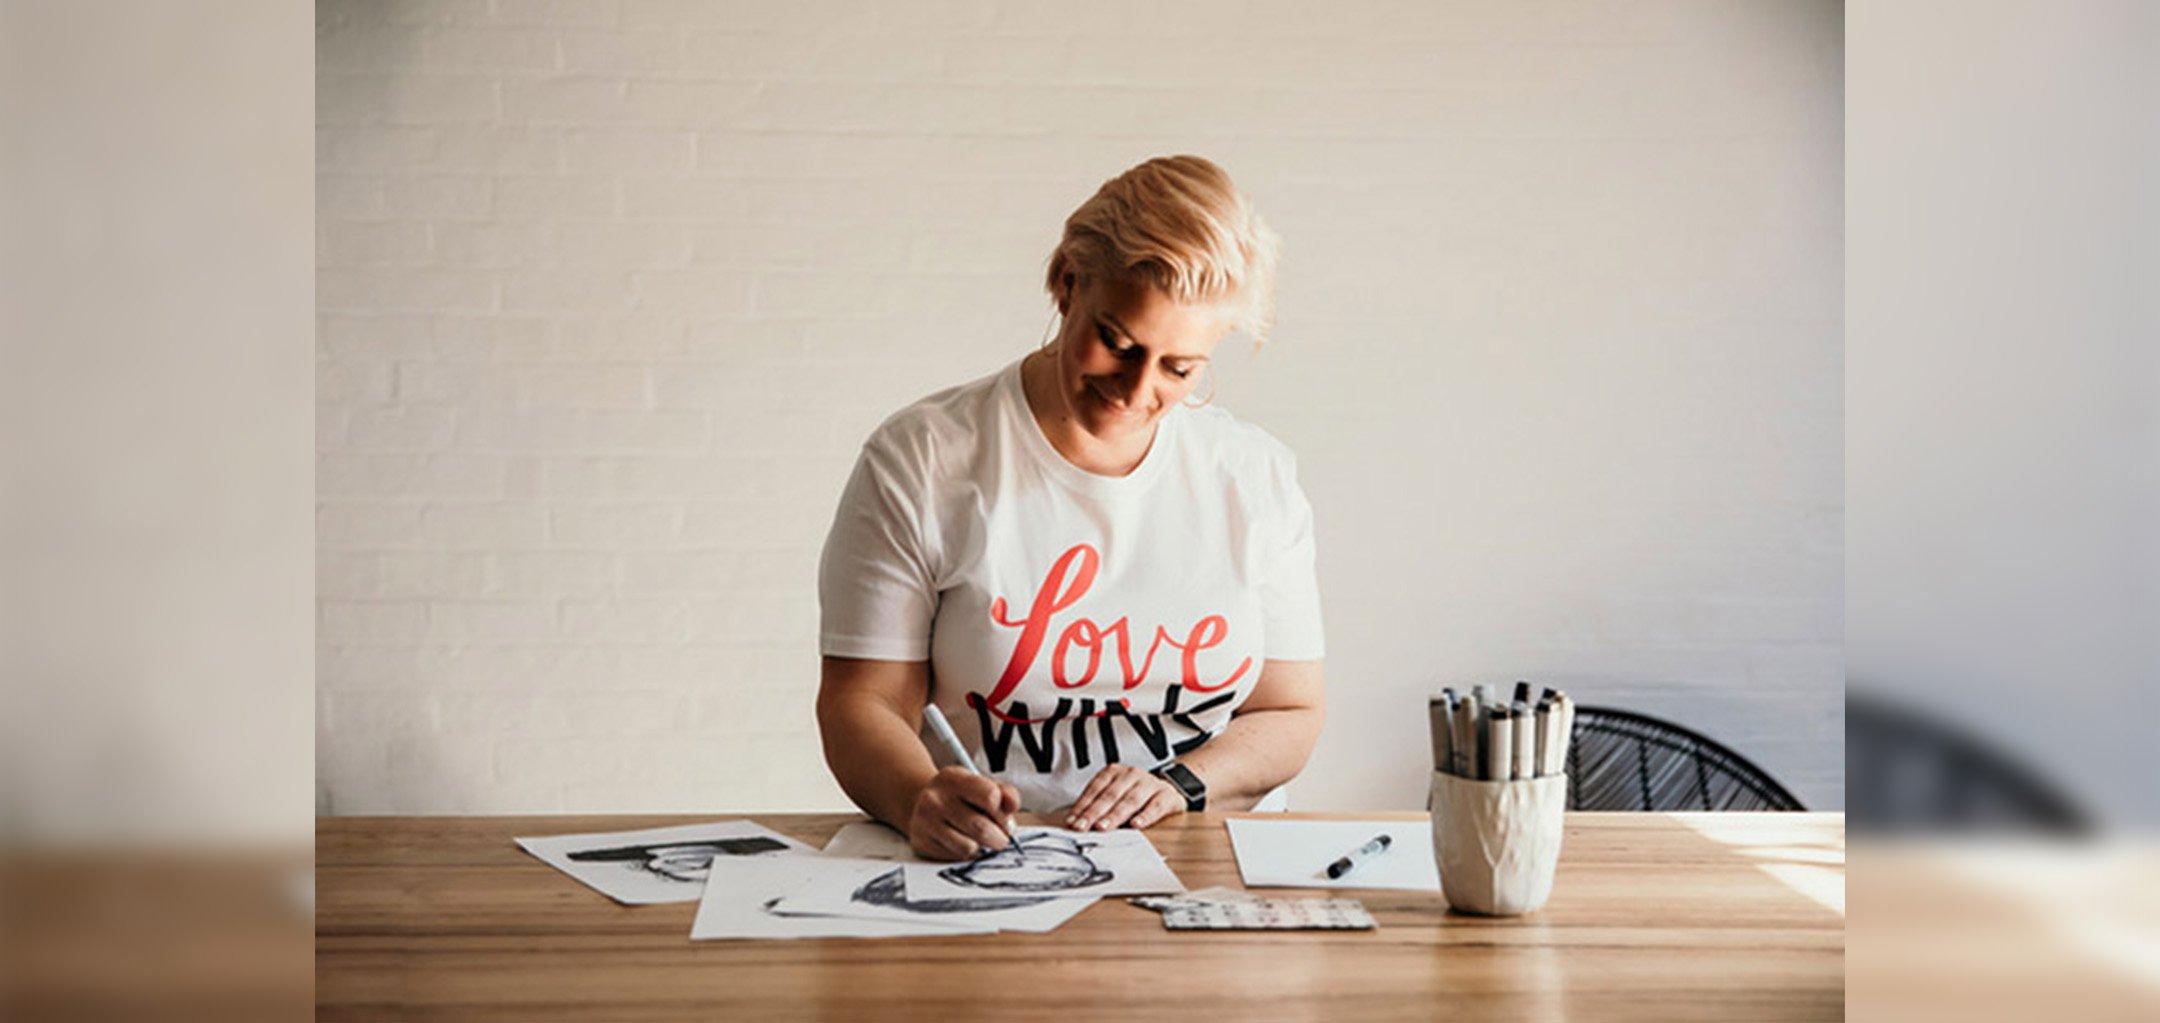 Jess McDonald working on her t-shirt designs